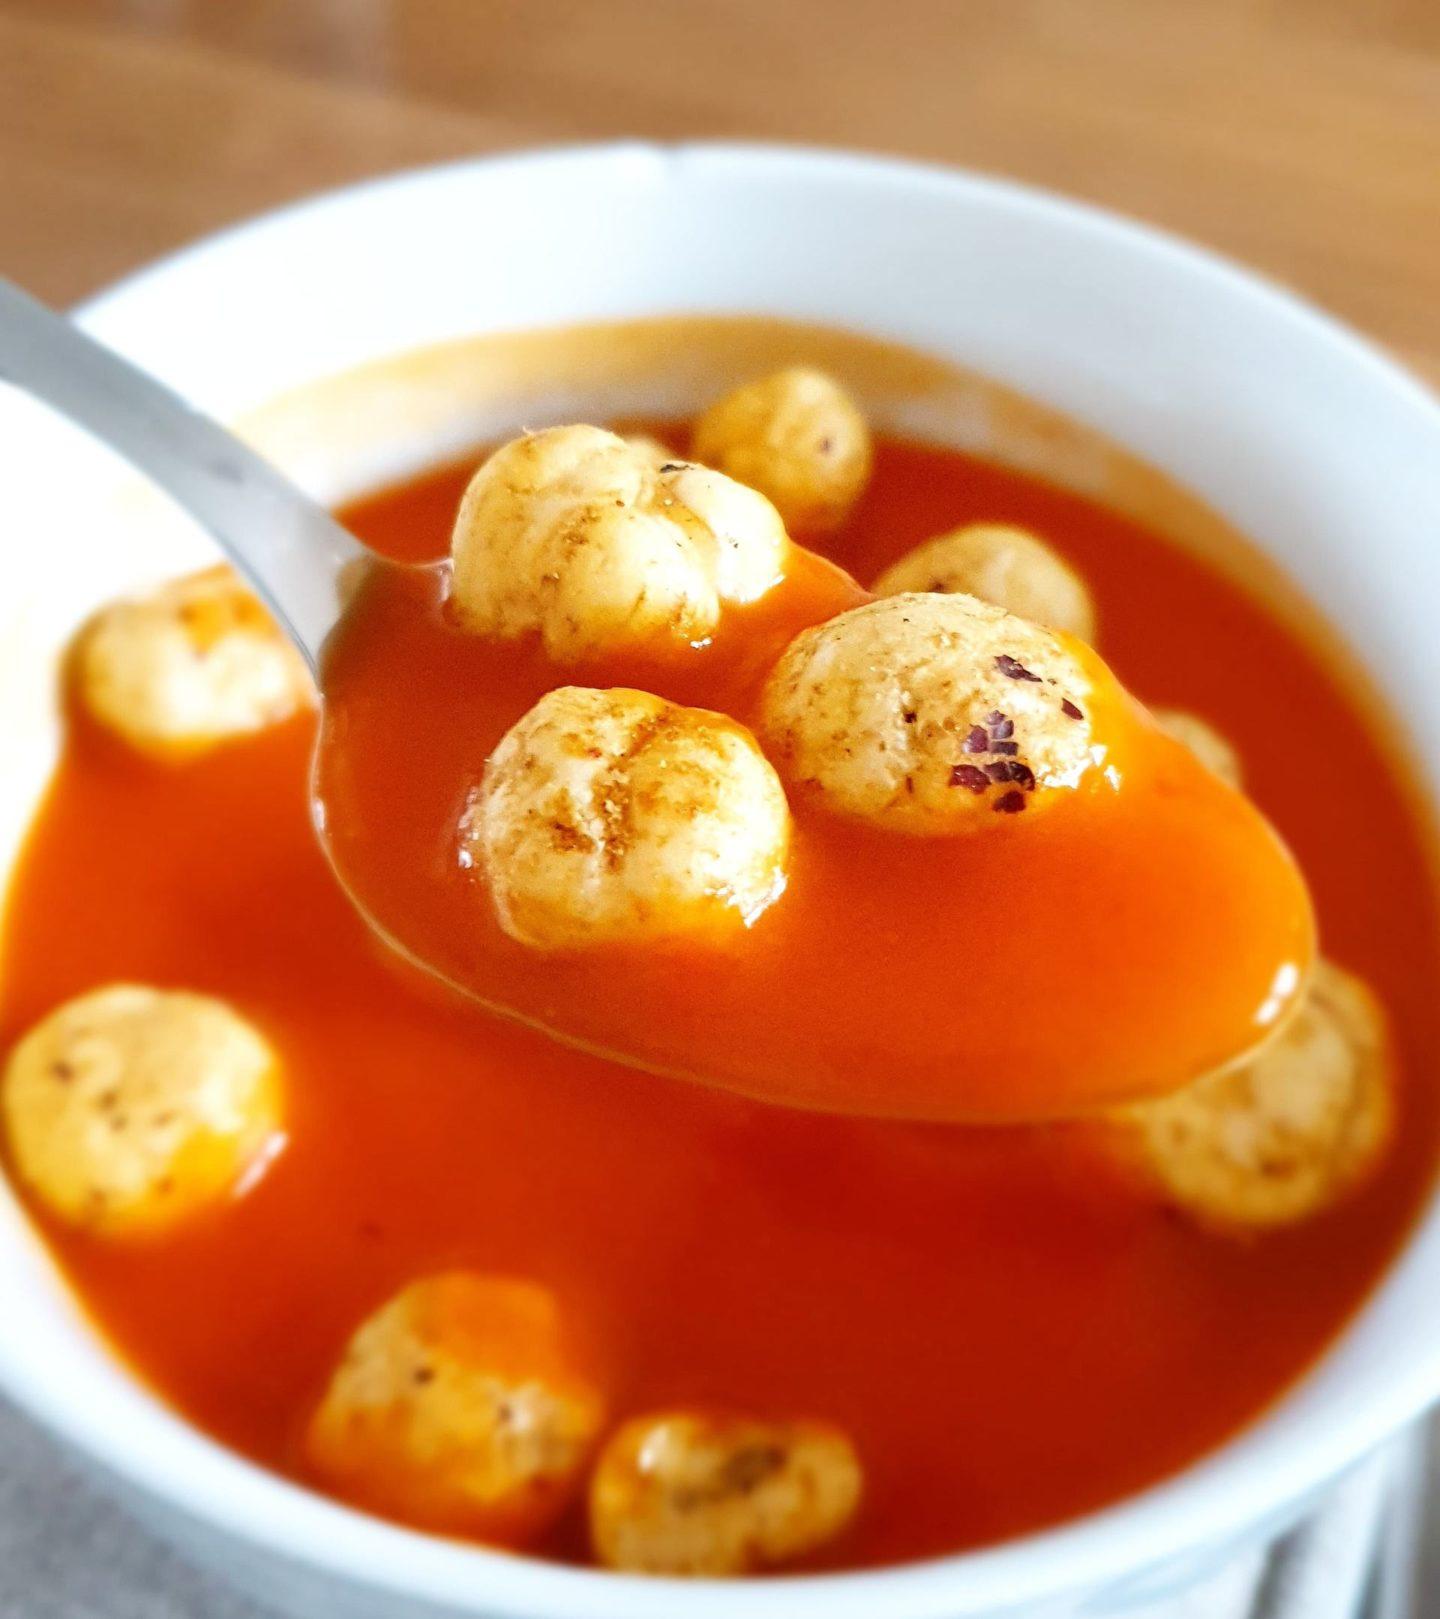 Plant Pops | Plant-based Vegan Snacks Under 99 Calories